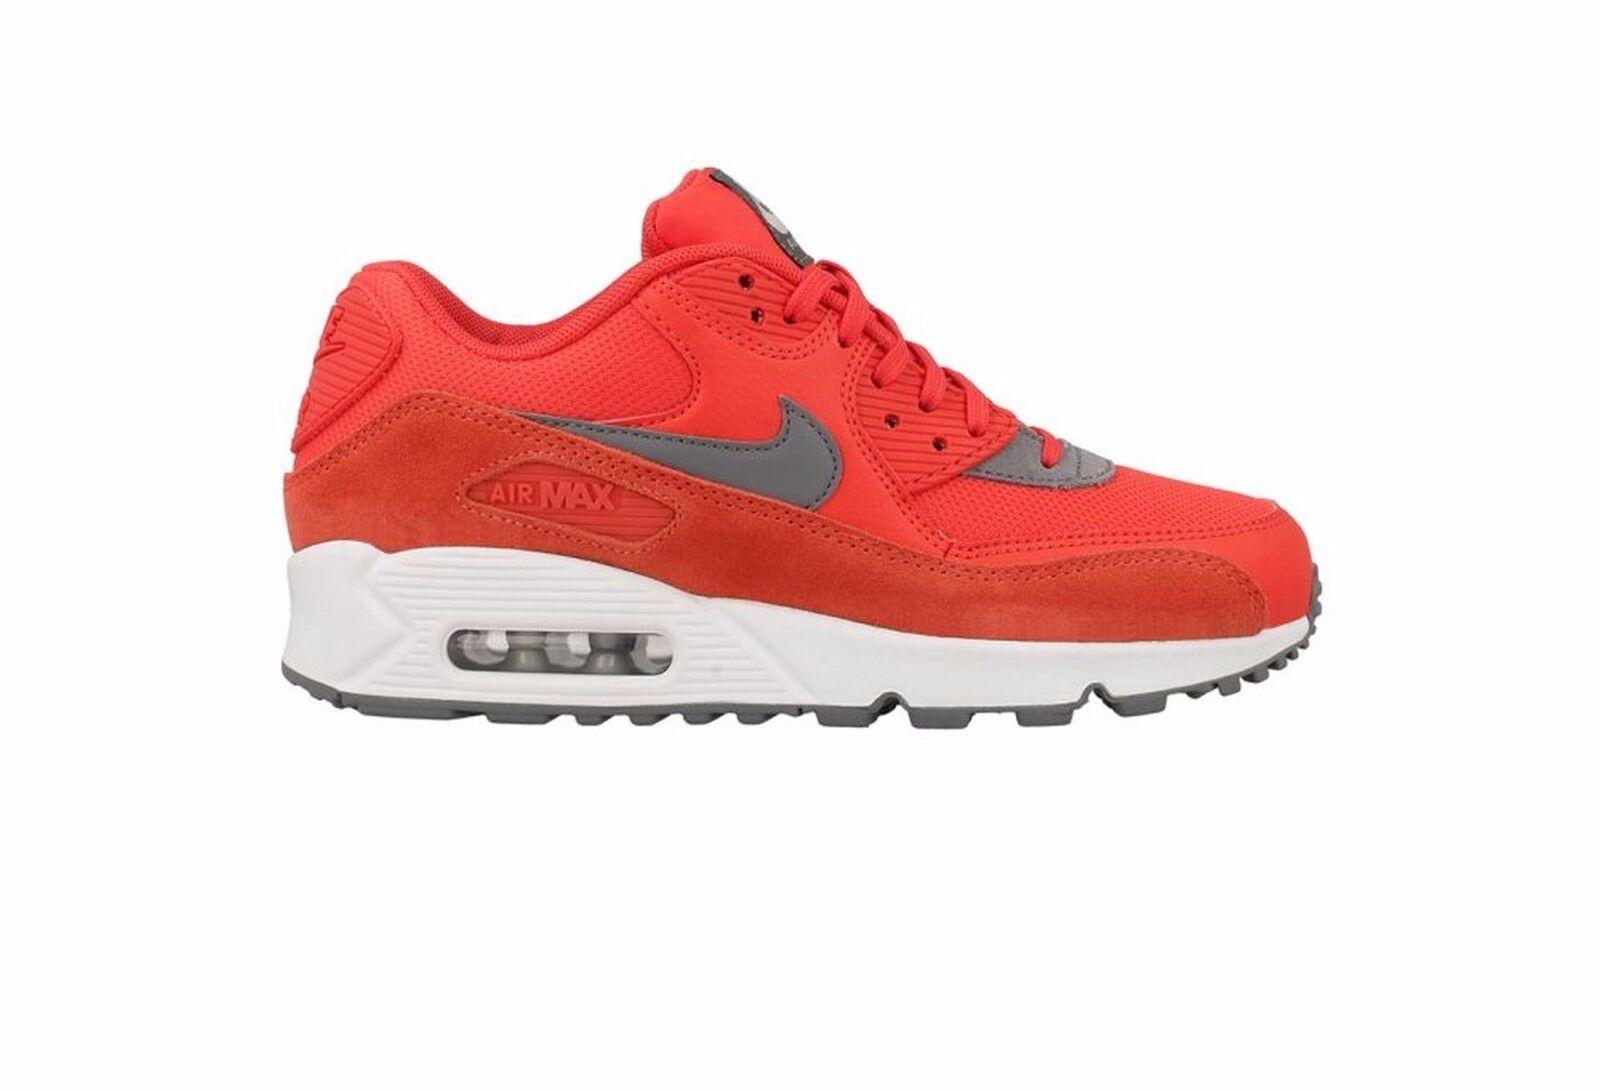 Nike libera tr forma 4 donne nere hanno / bianco / cool grey / lupo grigio scarpe sz 12